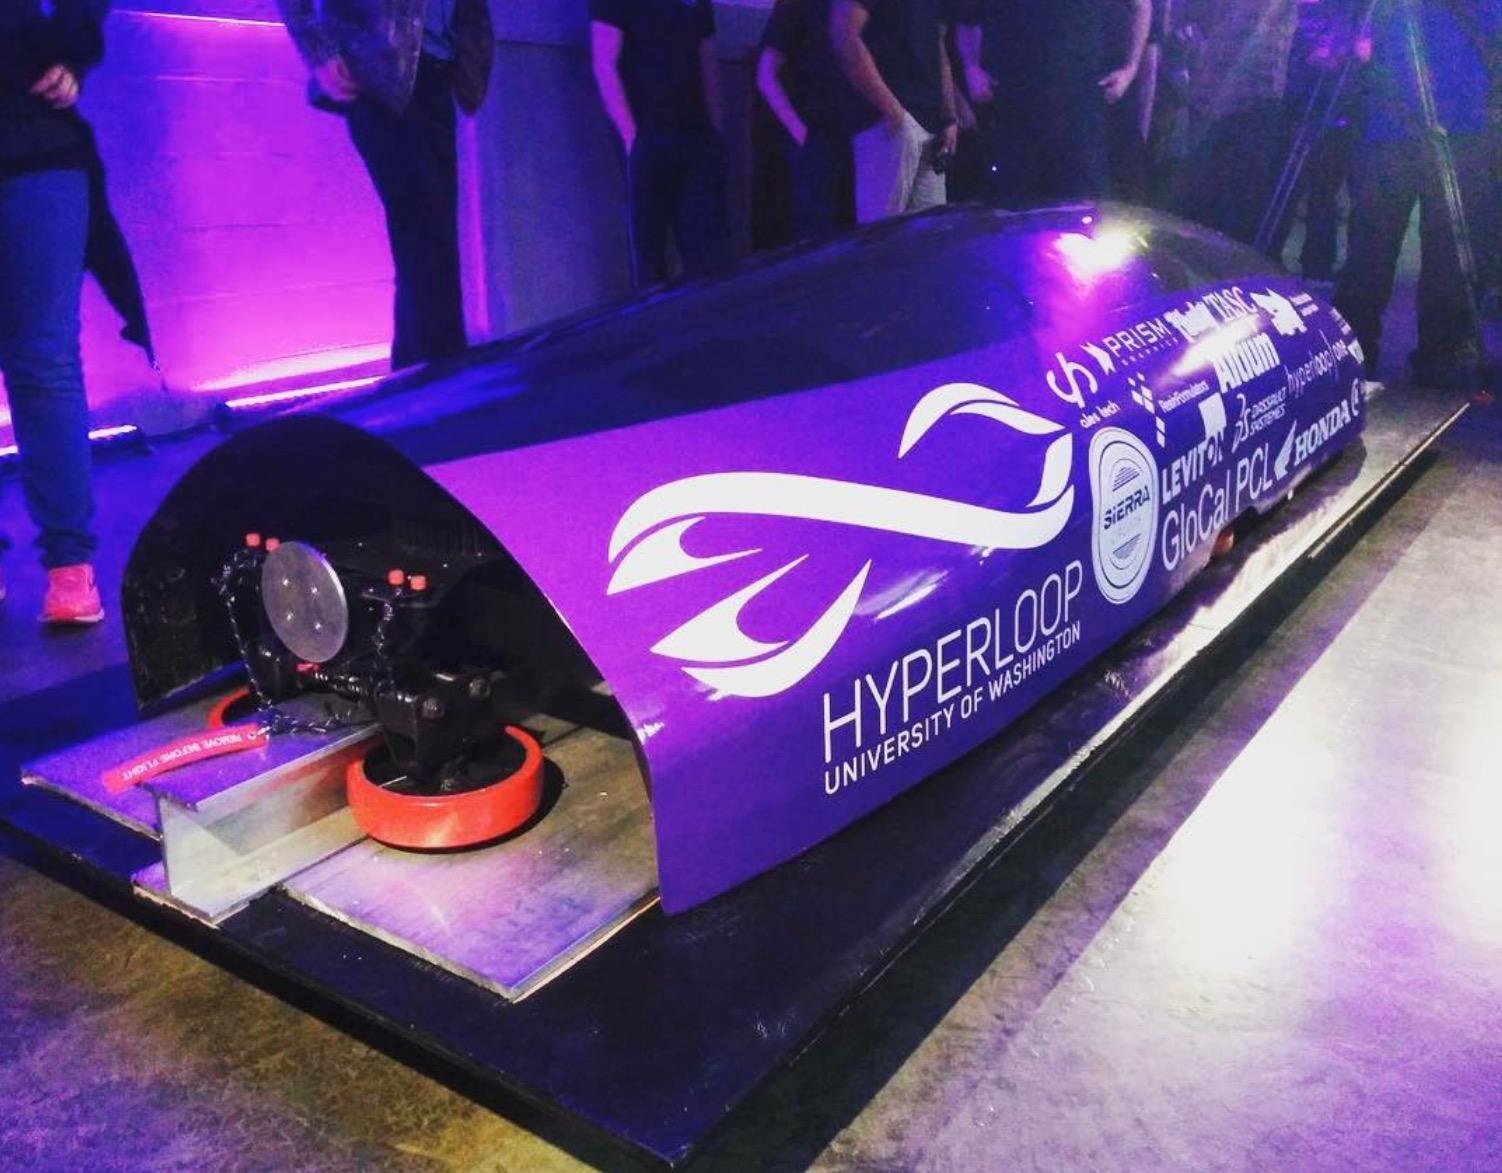 UWashington Hyperloop